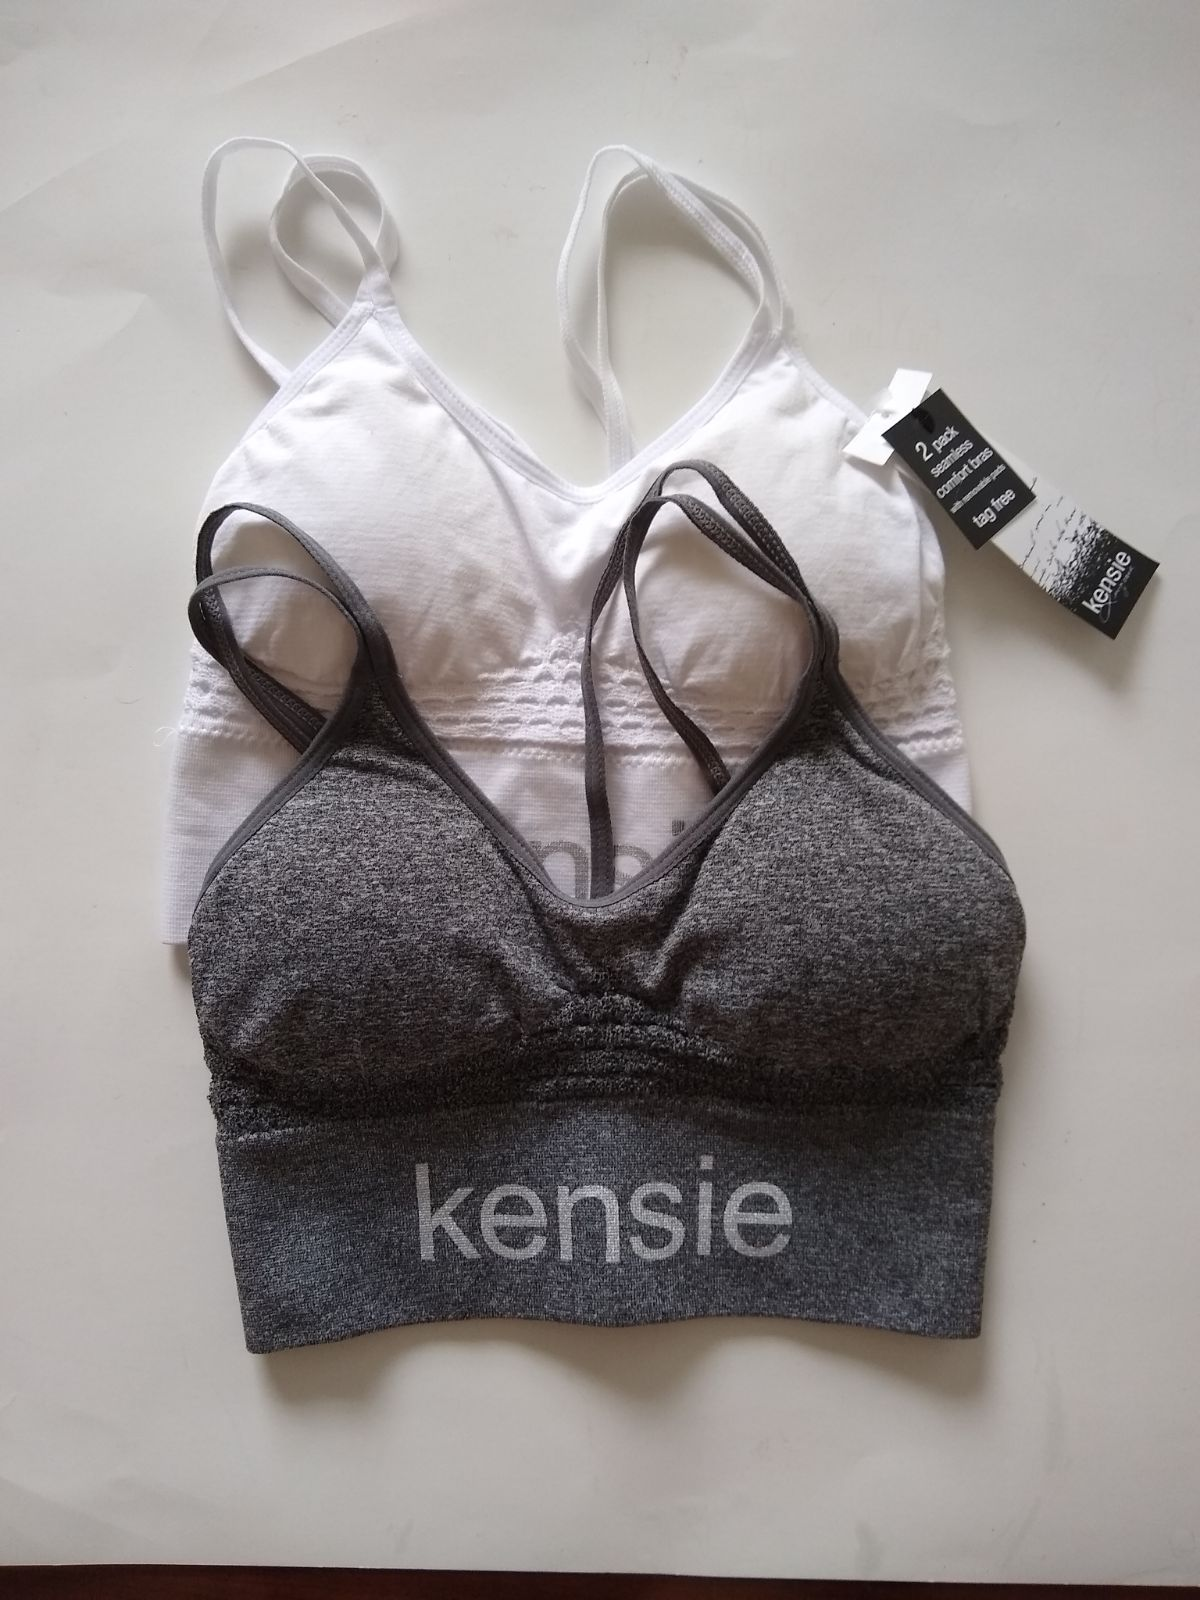 Kensie Women 2Pk Small new